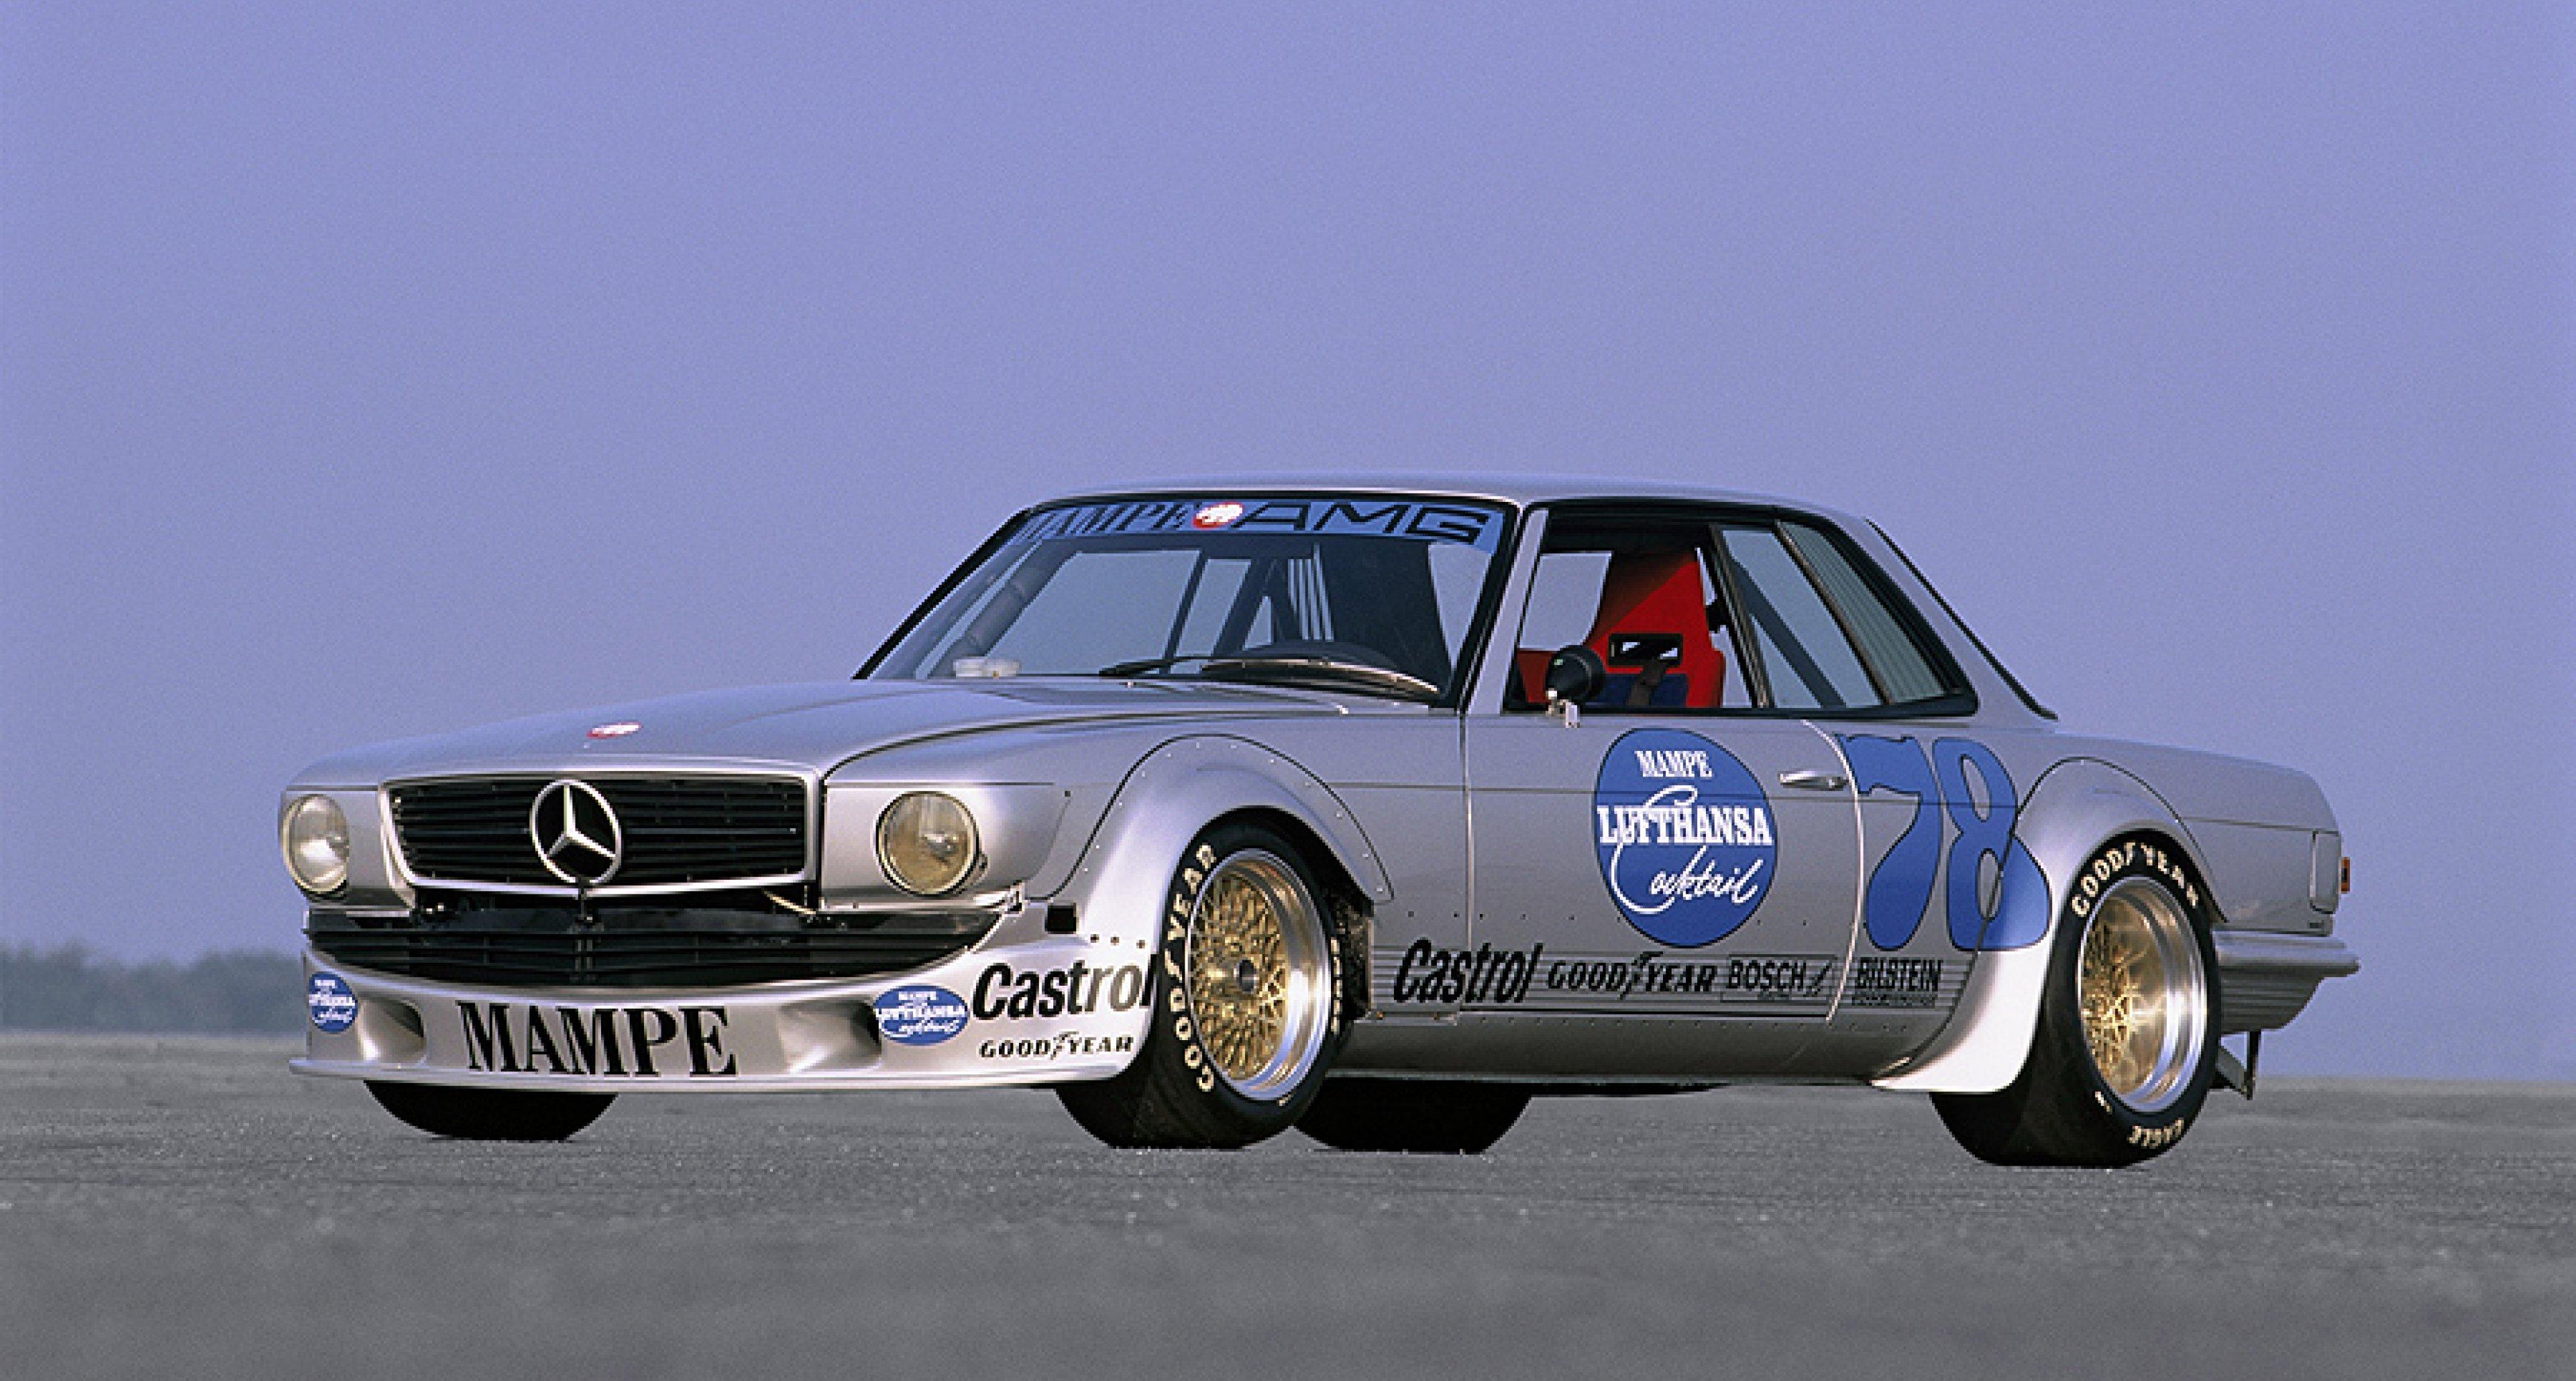 Mercedes benz 450 slc amg 39 mampe 39 touring car classic for Mercedes benz touring car